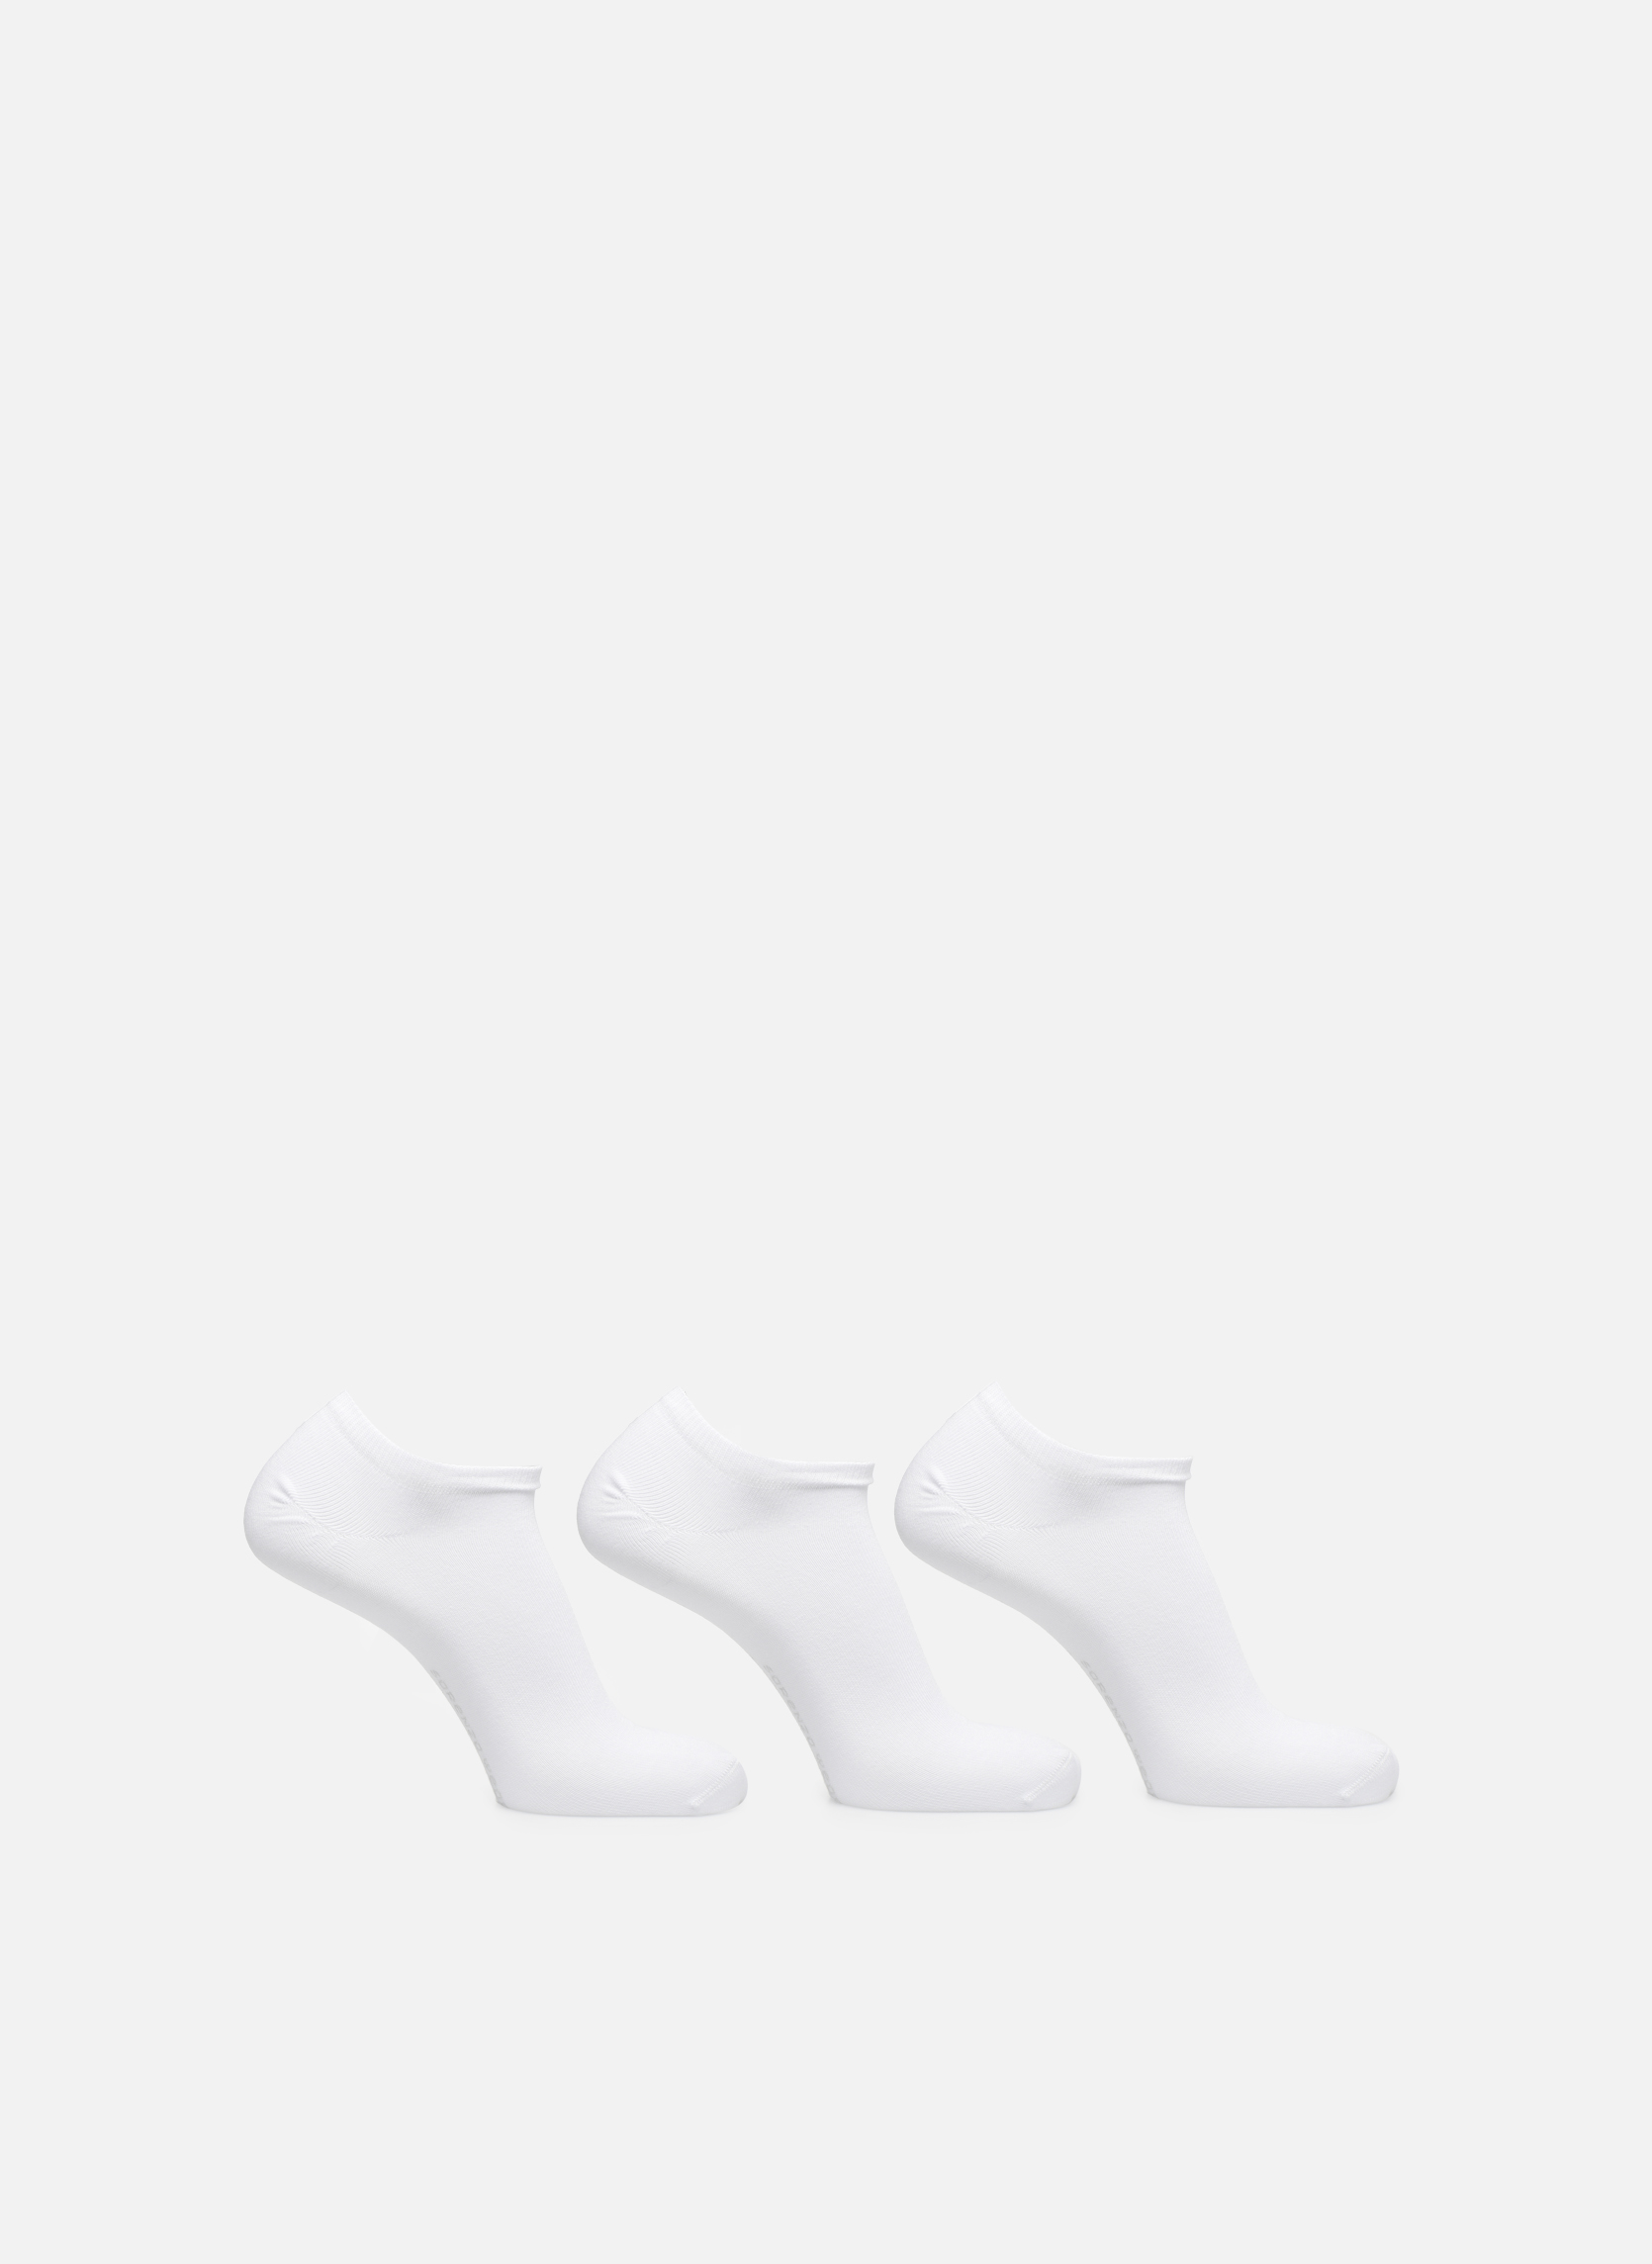 blanc x 3